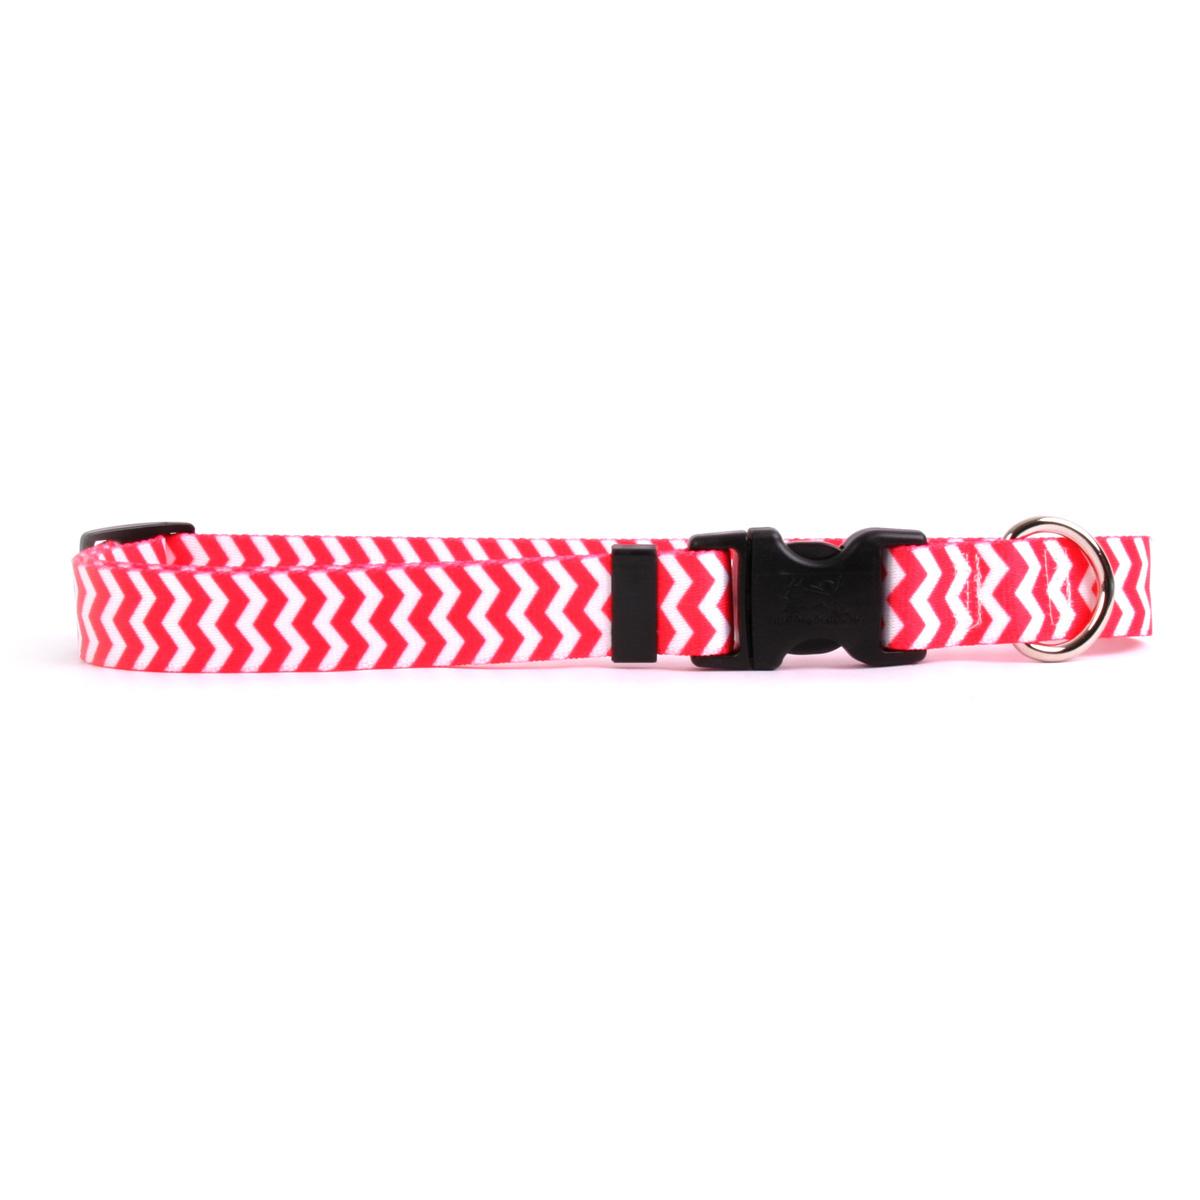 Chevron Dog Collar by Yellow Dog - Strawberry